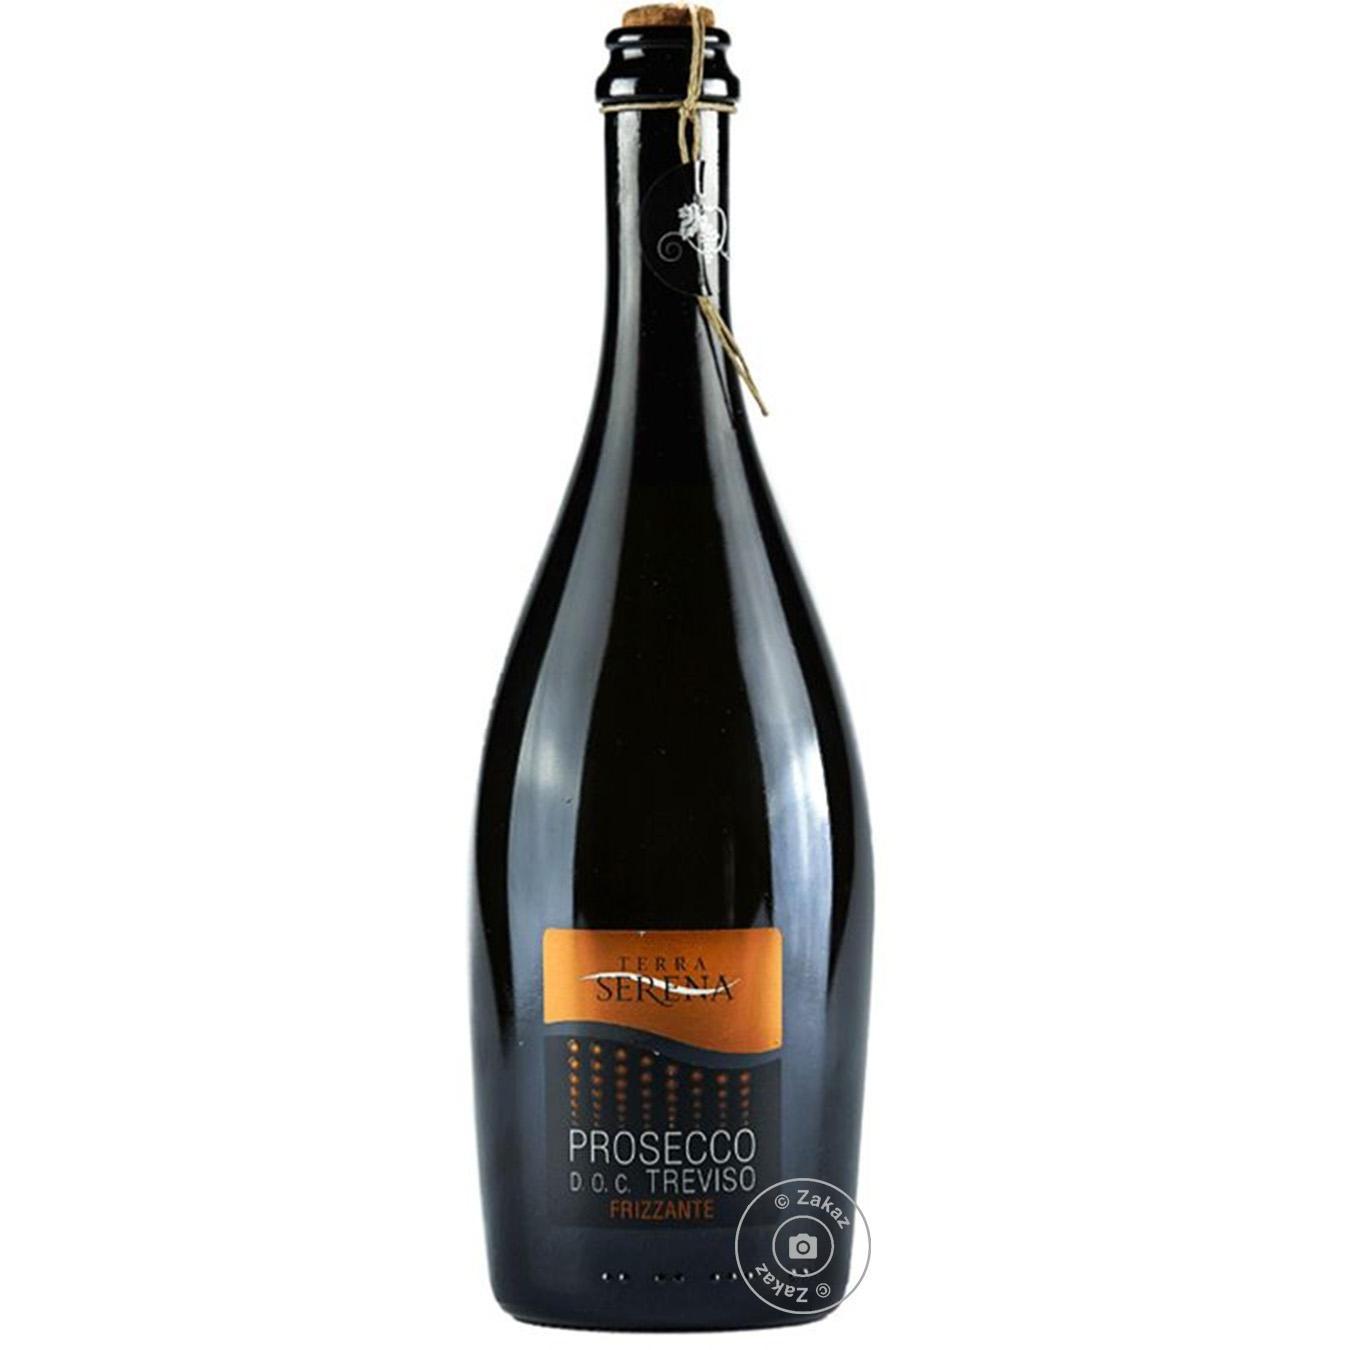 Купить 499676, Вино игристое Terra Serena Prosecco Frizante белое сухое 10.5% 0, 75л